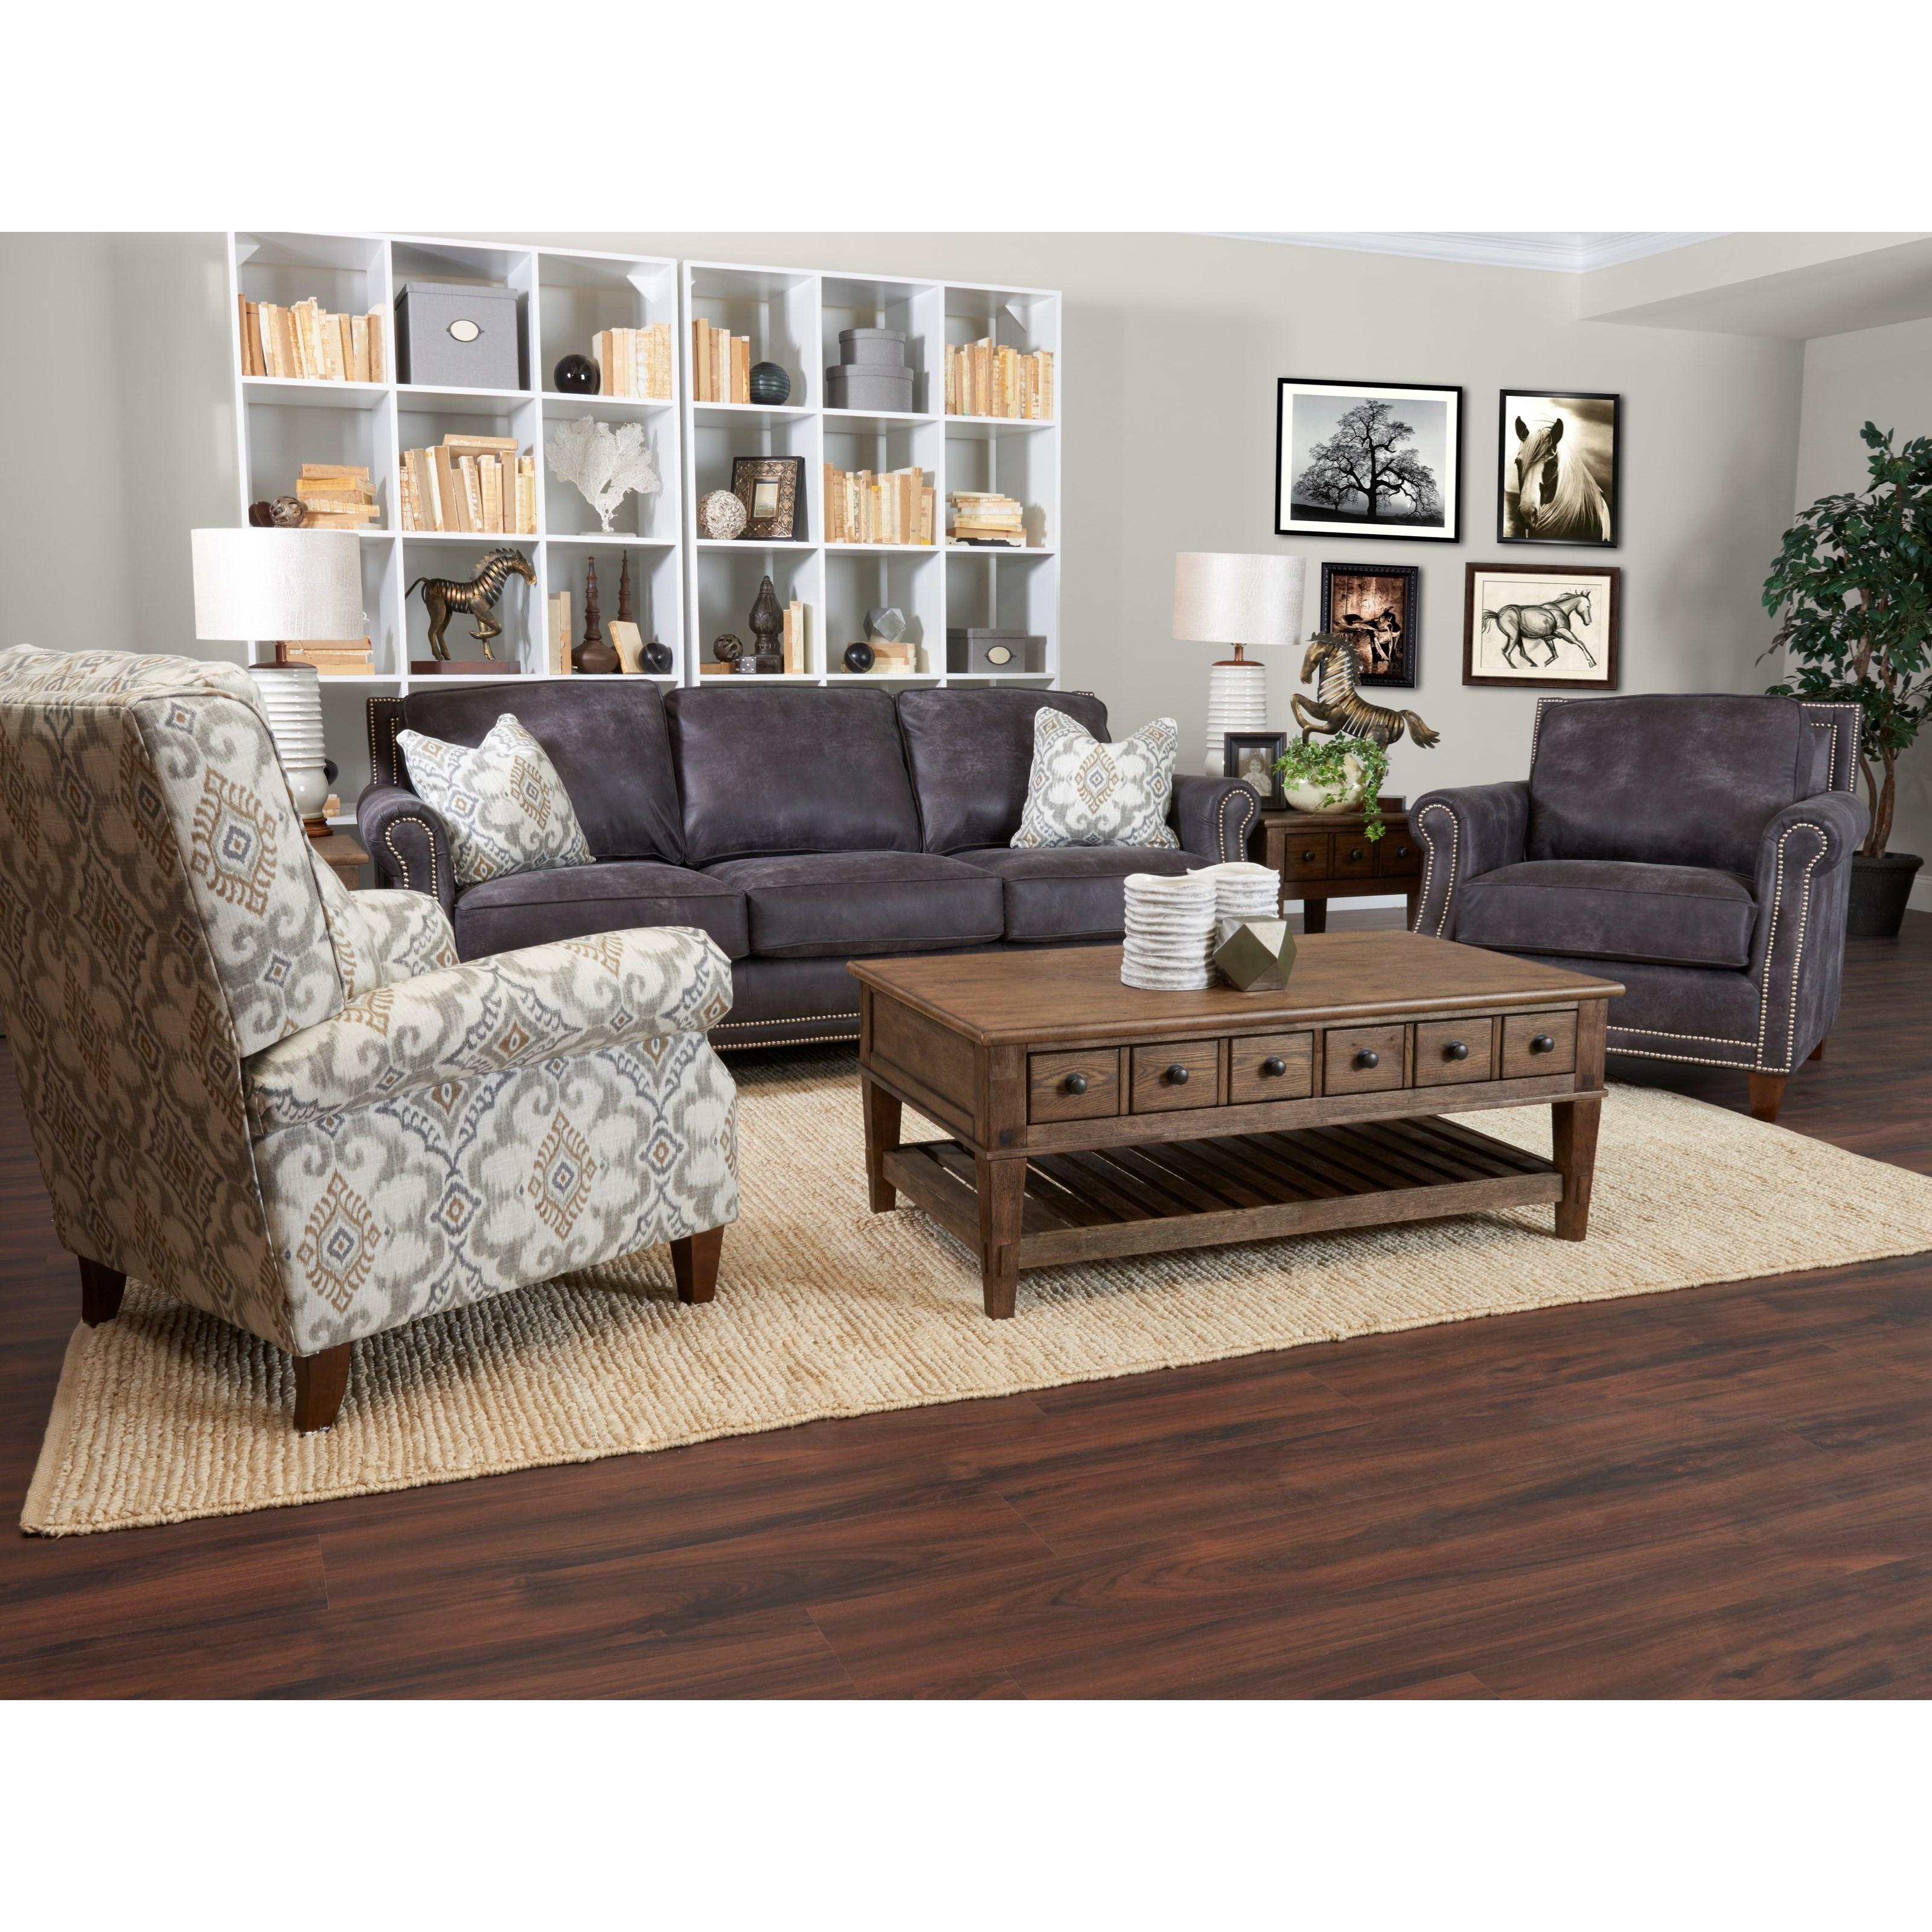 Klaussner York Living Room Group Pilgrim Furniture City Stationary Living Room Groups